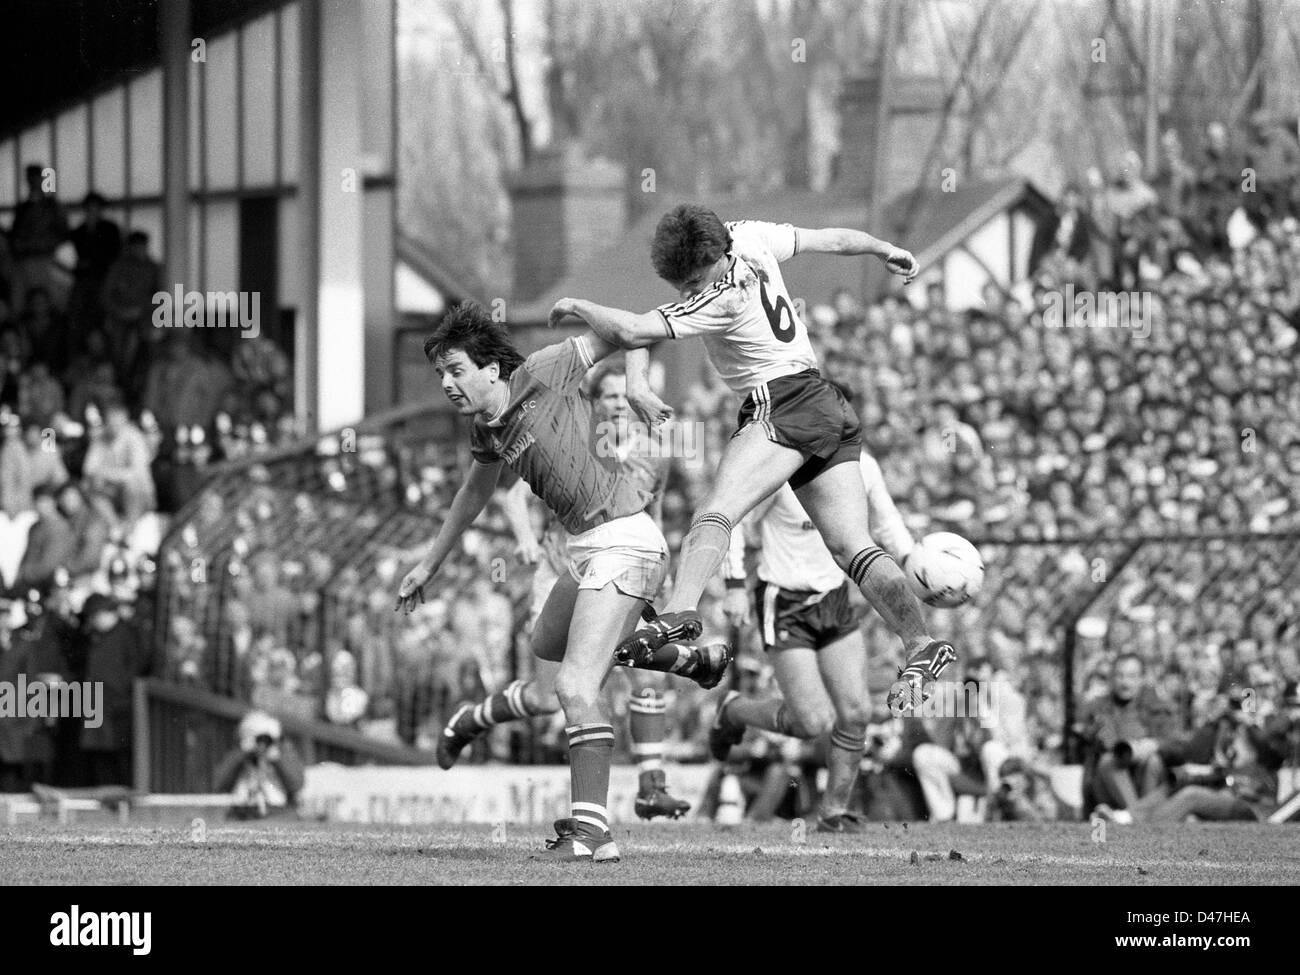 Graeme Sharp et Mal Donaghy Everton V Luton Town FA Cup semi finale à Villa Park 13/4/85 Photo Stock